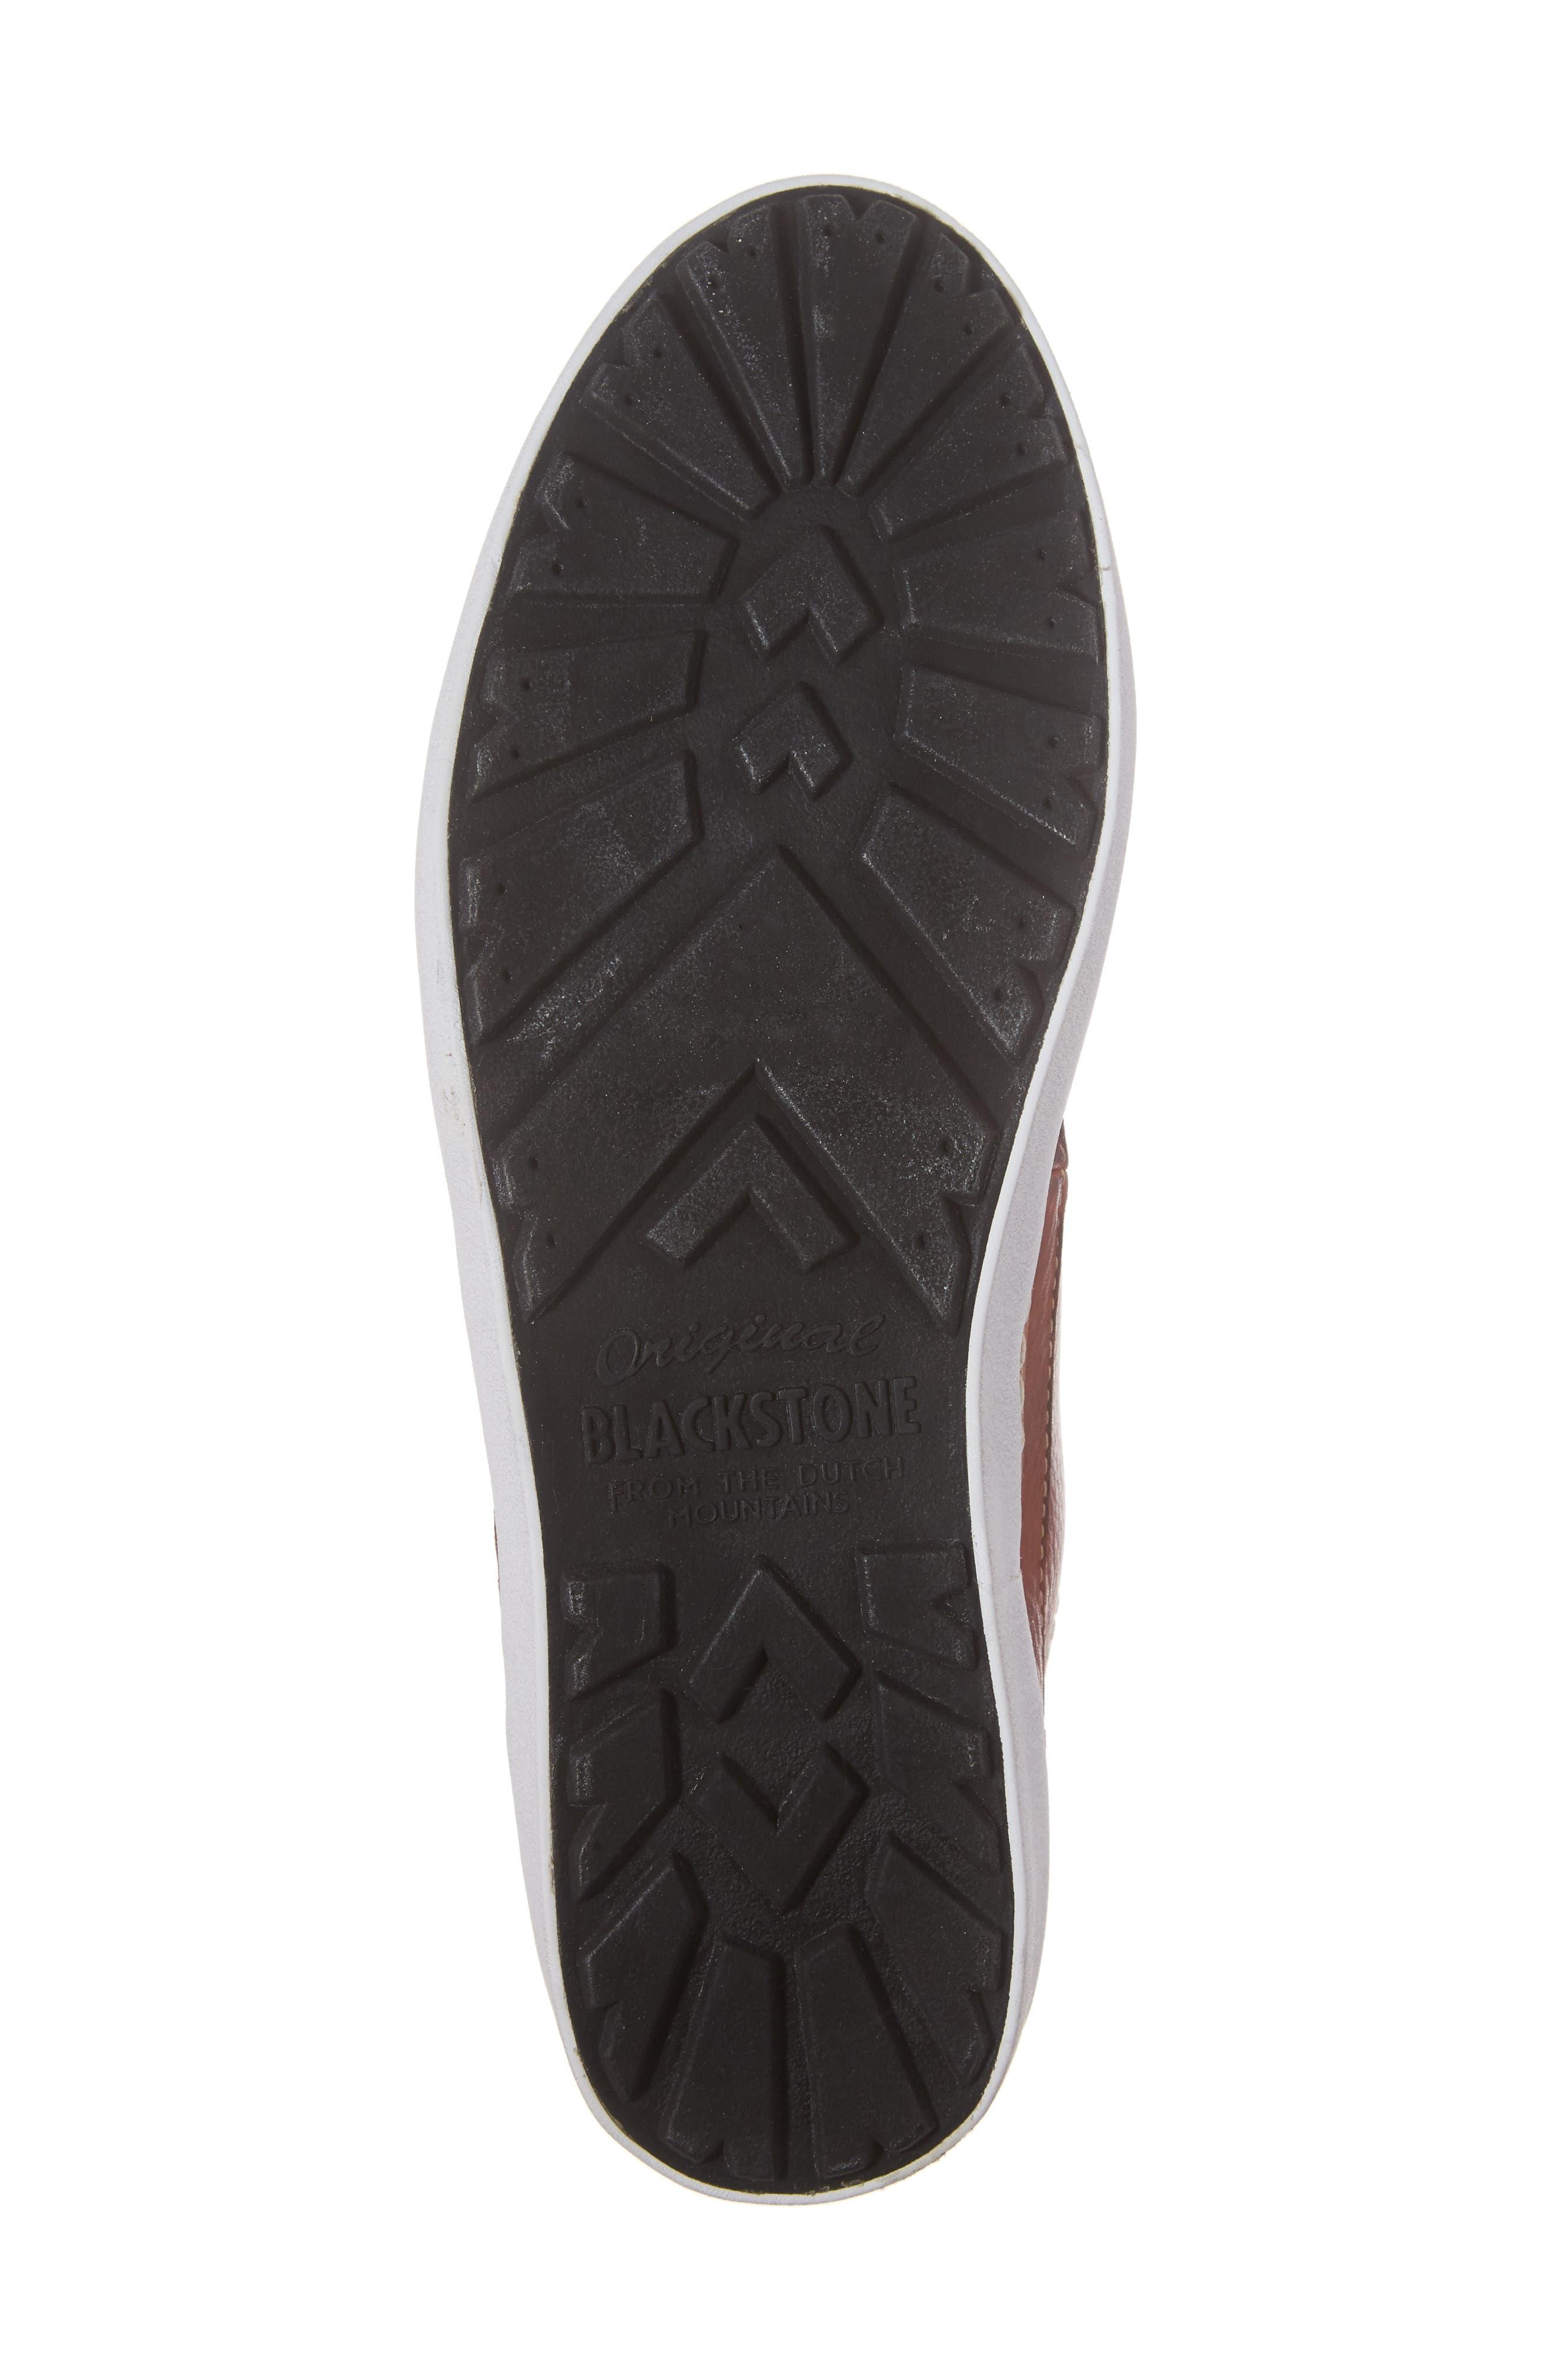 BLACKSTONE,                             'AM 32' Shearling Lined Boot,                             Alternate thumbnail 6, color,                             200